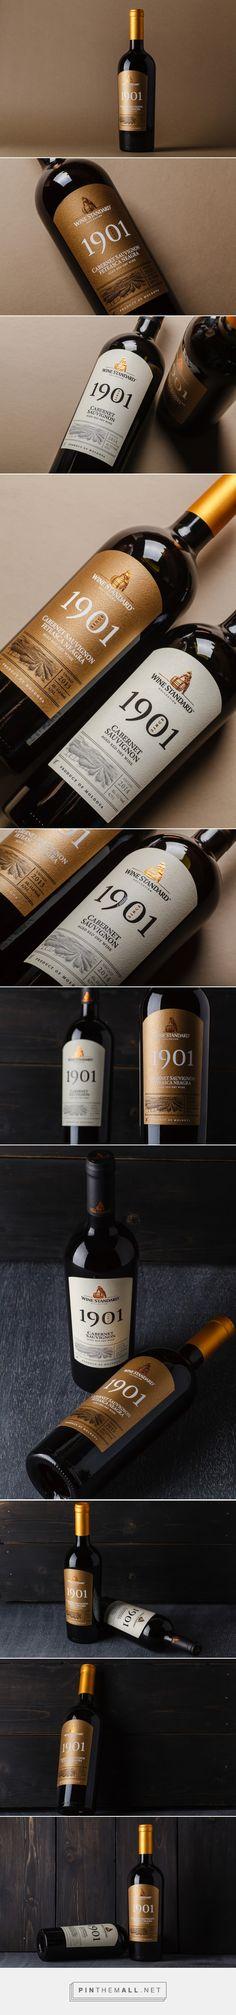 Wine Standard 1901 label design by 43'oz - Design Studio - http://www.packagingoftheworld.com/2017/01/wine-standard-1901.html